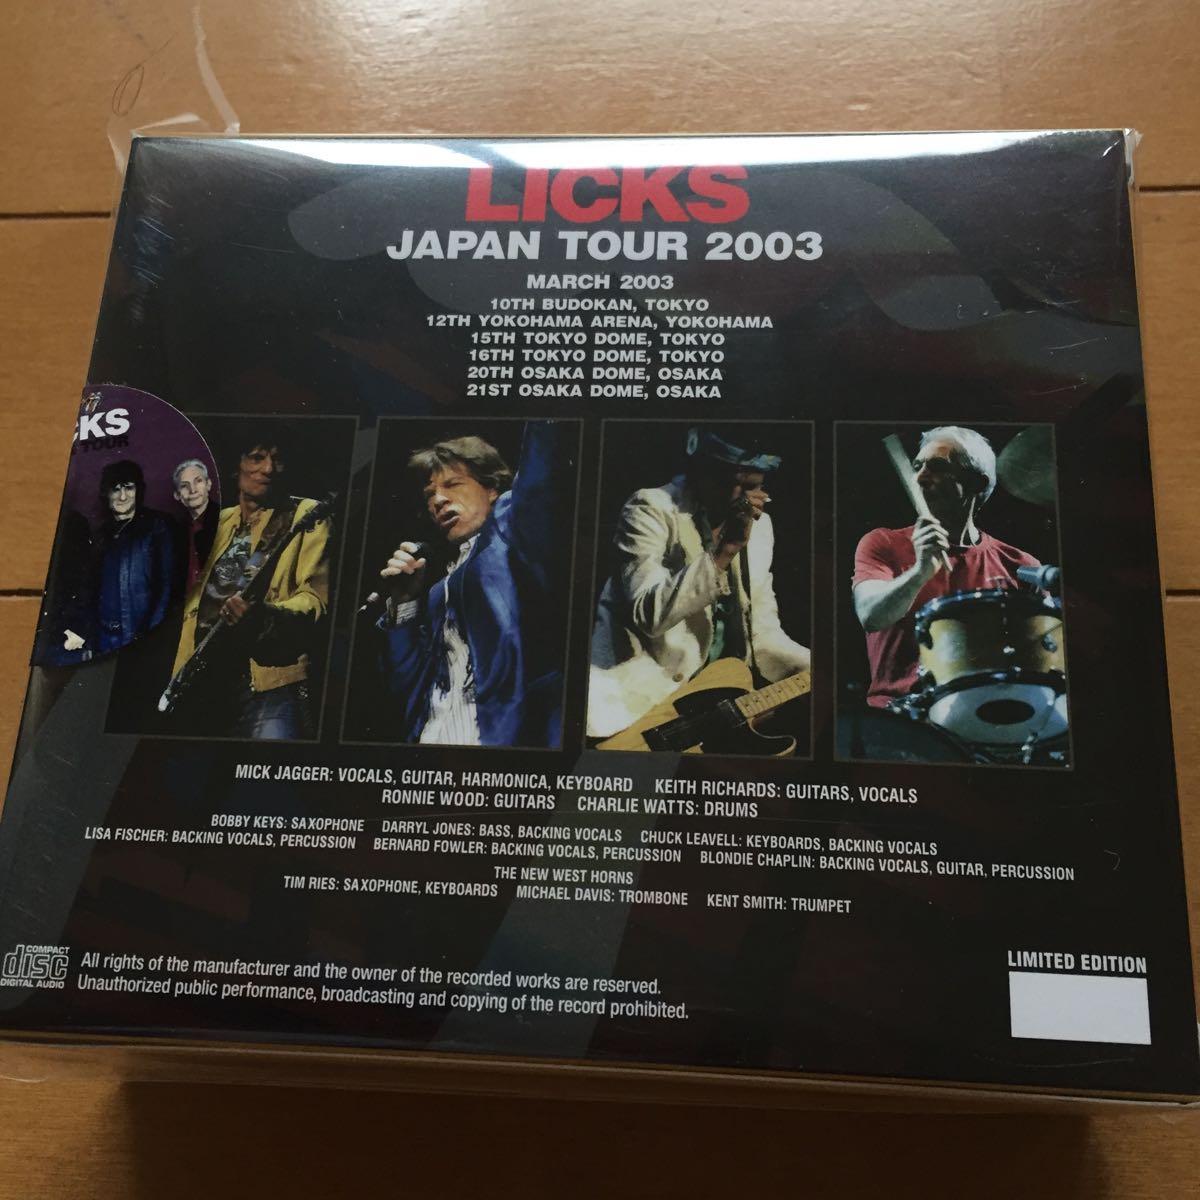 Rolling Stones Licks Japan Tour 2003 未開封ボックス 再入荷版_画像2